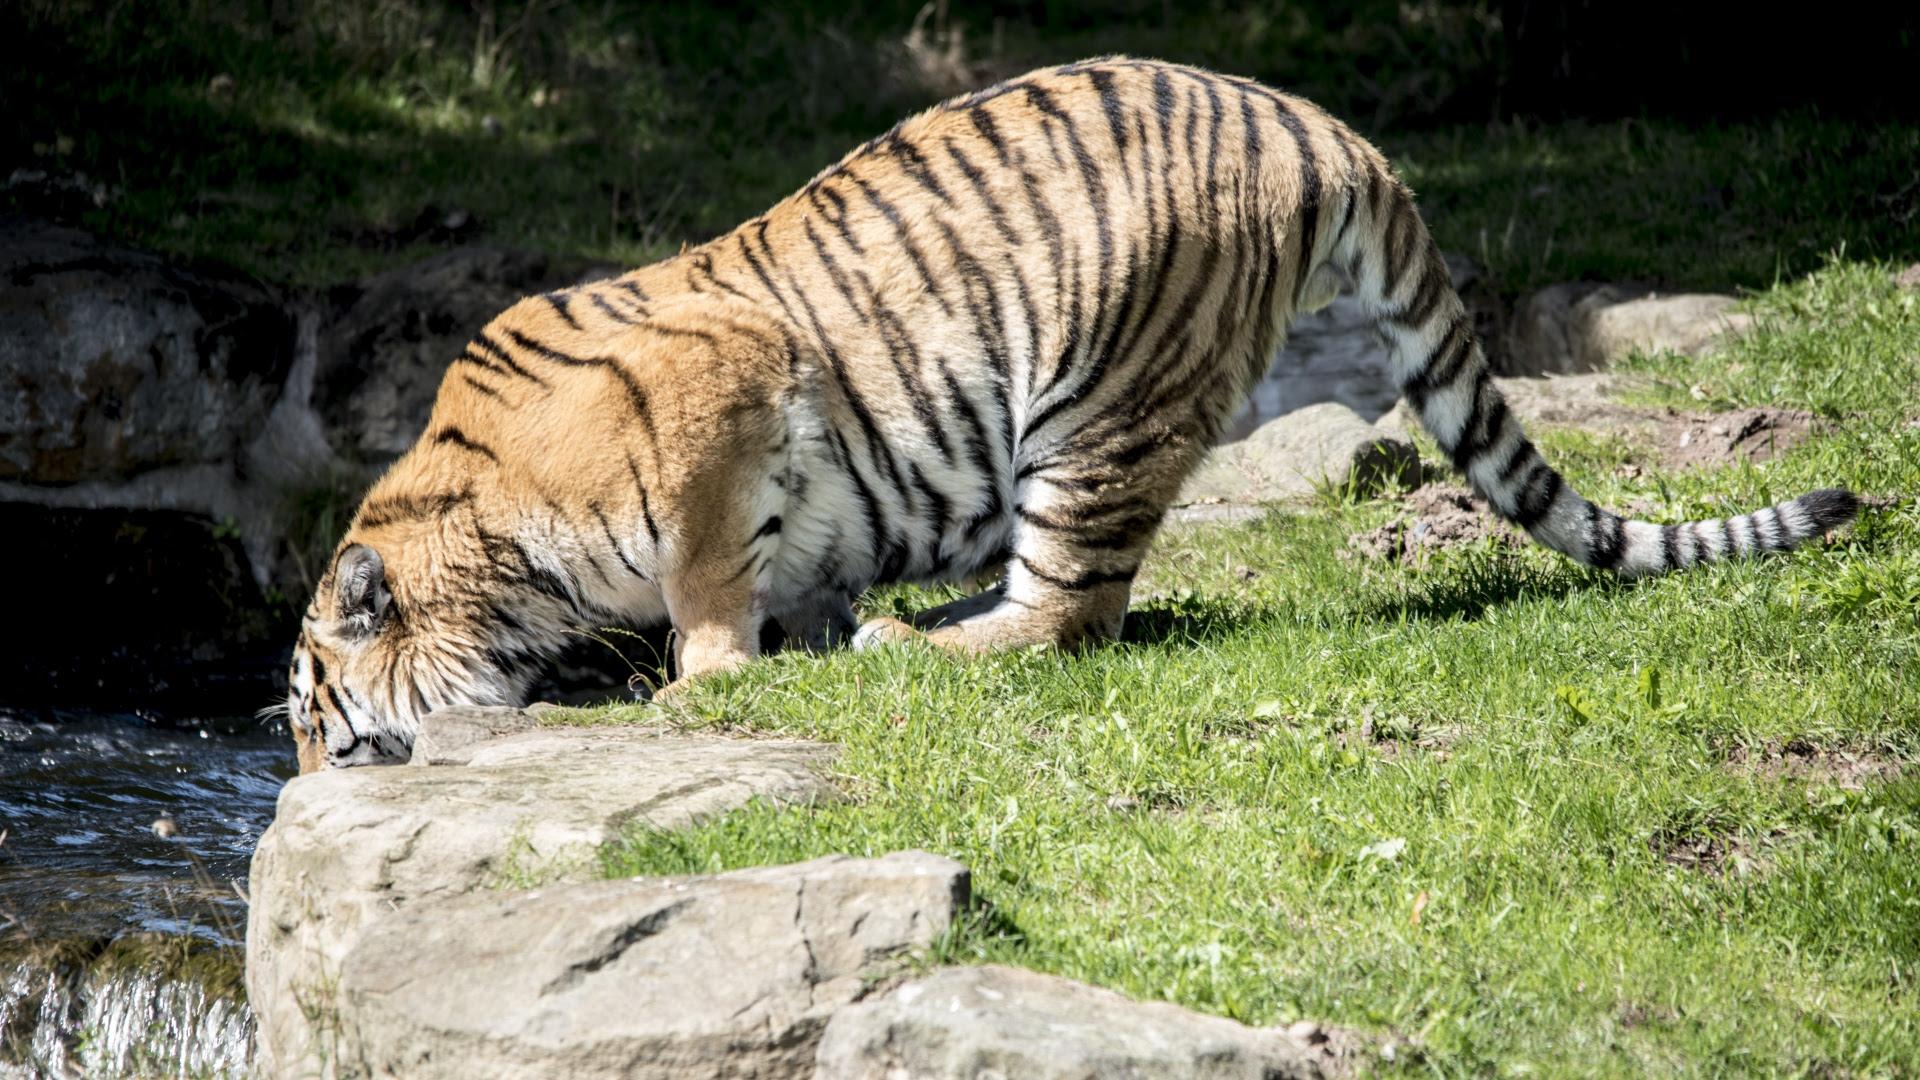 Tiger Predator River Thirst [1920x1080]